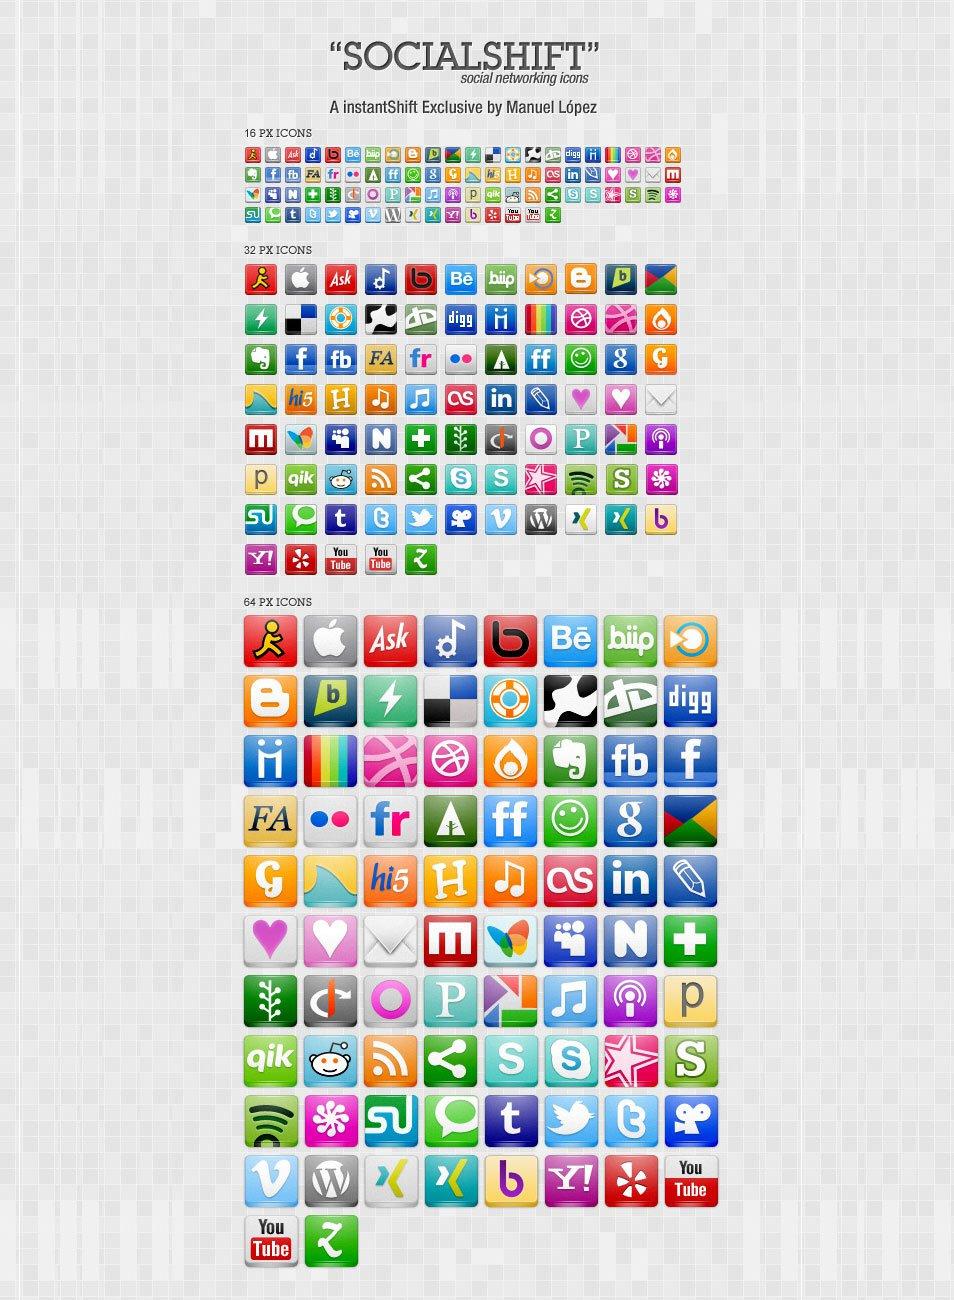 SocialShift Icon Set: 246 Free Social Networking Icons